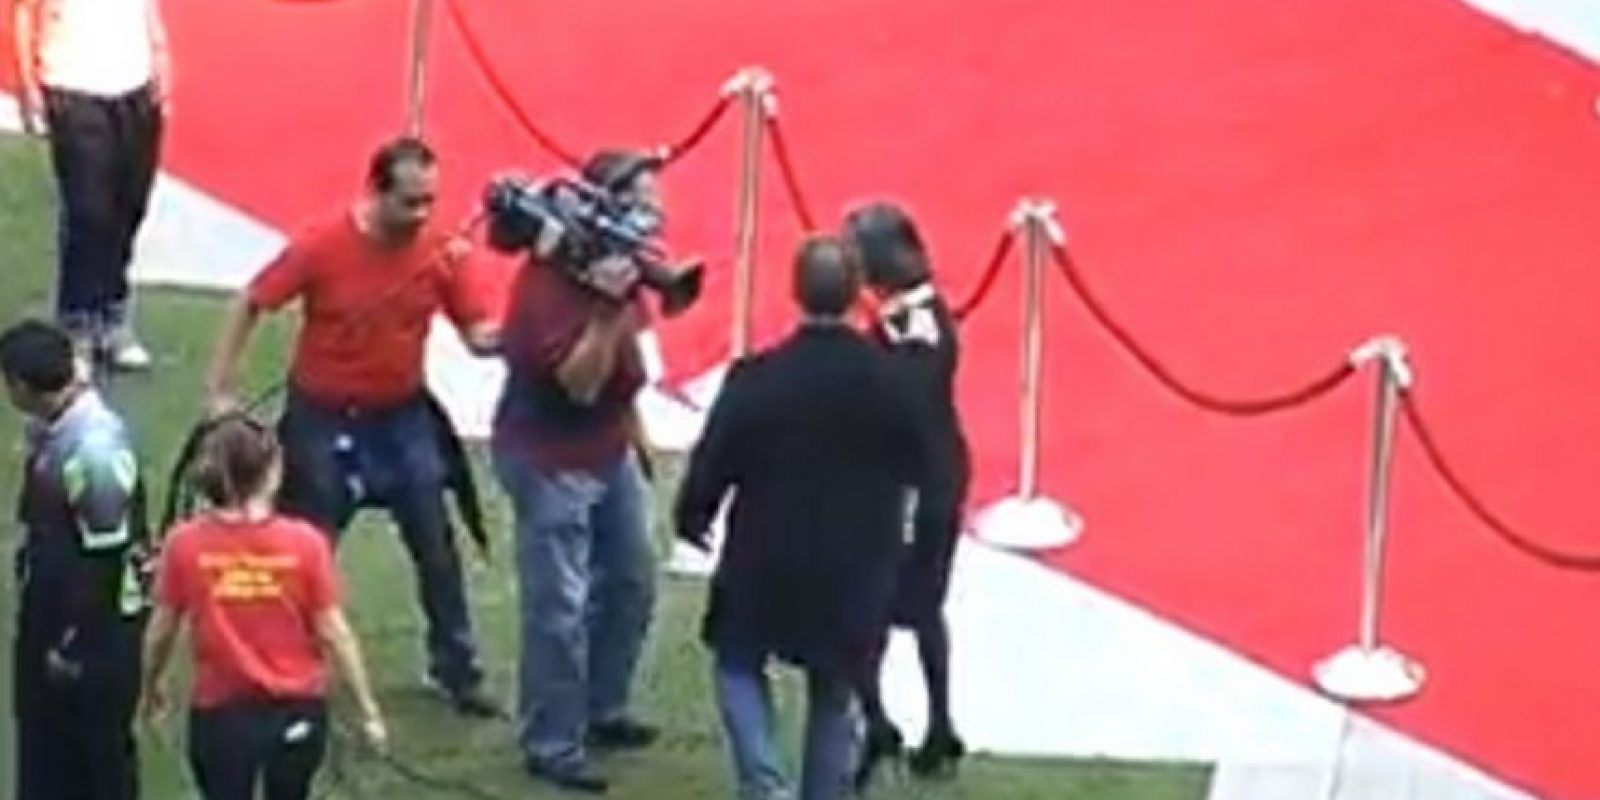 Florinda Meza le reclamó al trabajador Foto:FRE ZAGUE